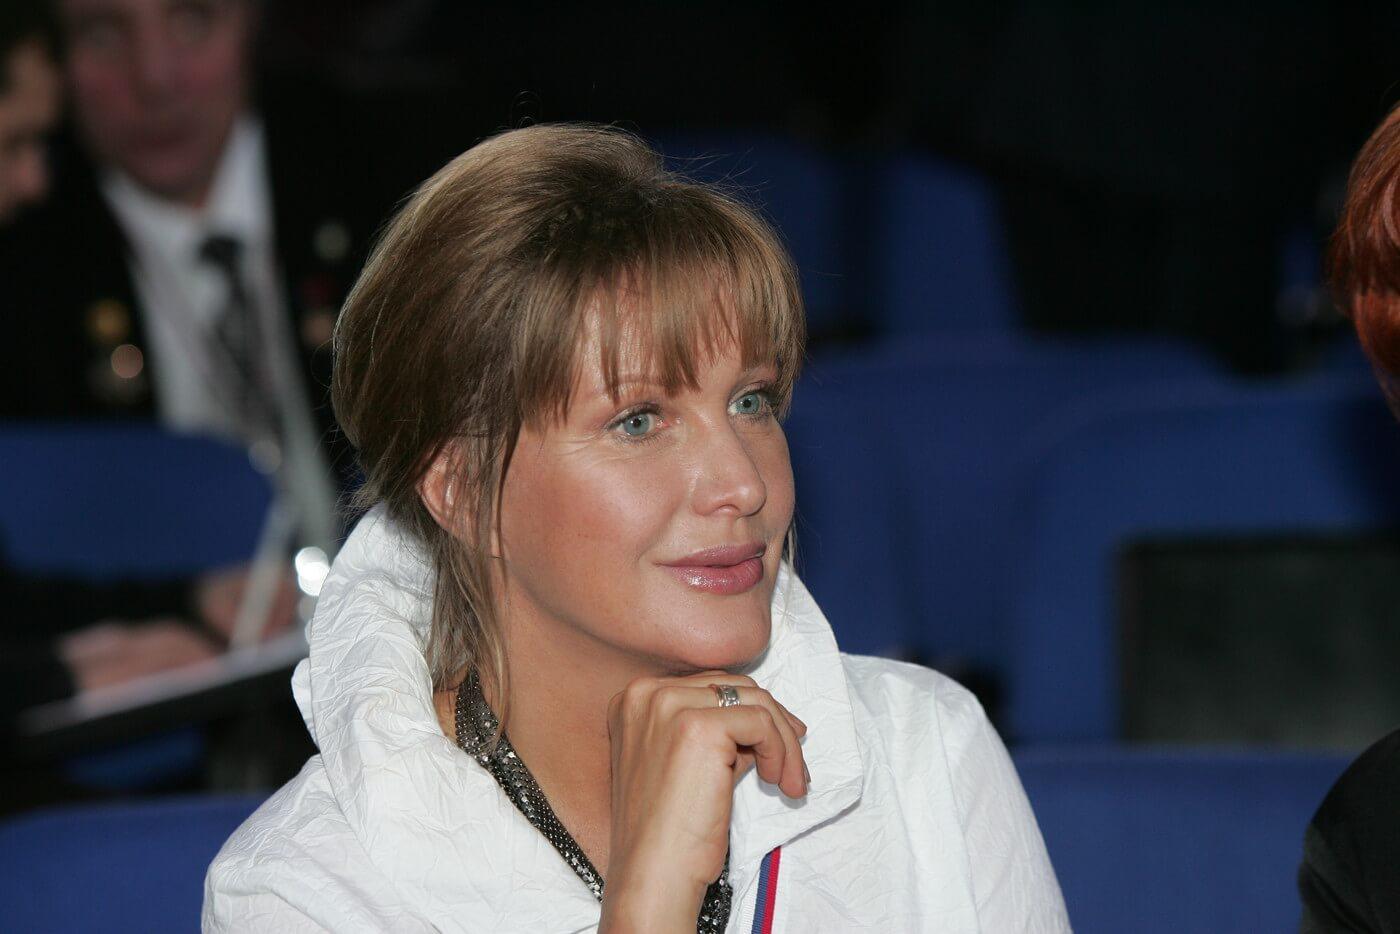 Елена Проклова сообщила о бесплодии Александра Абдулова